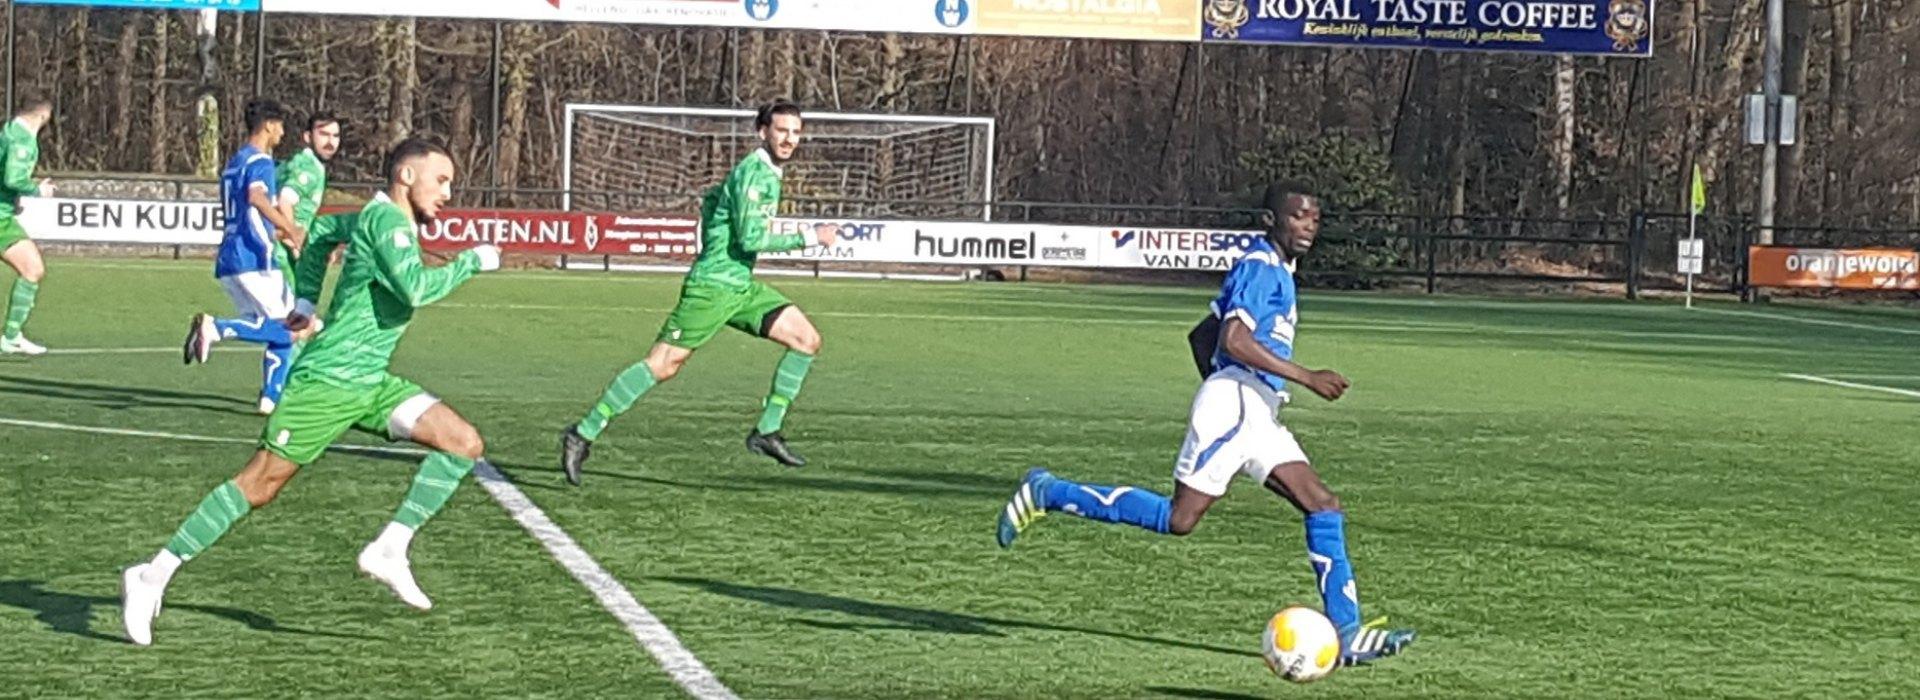 'Zomeravondvoetbal' tegen Nw Utrecht